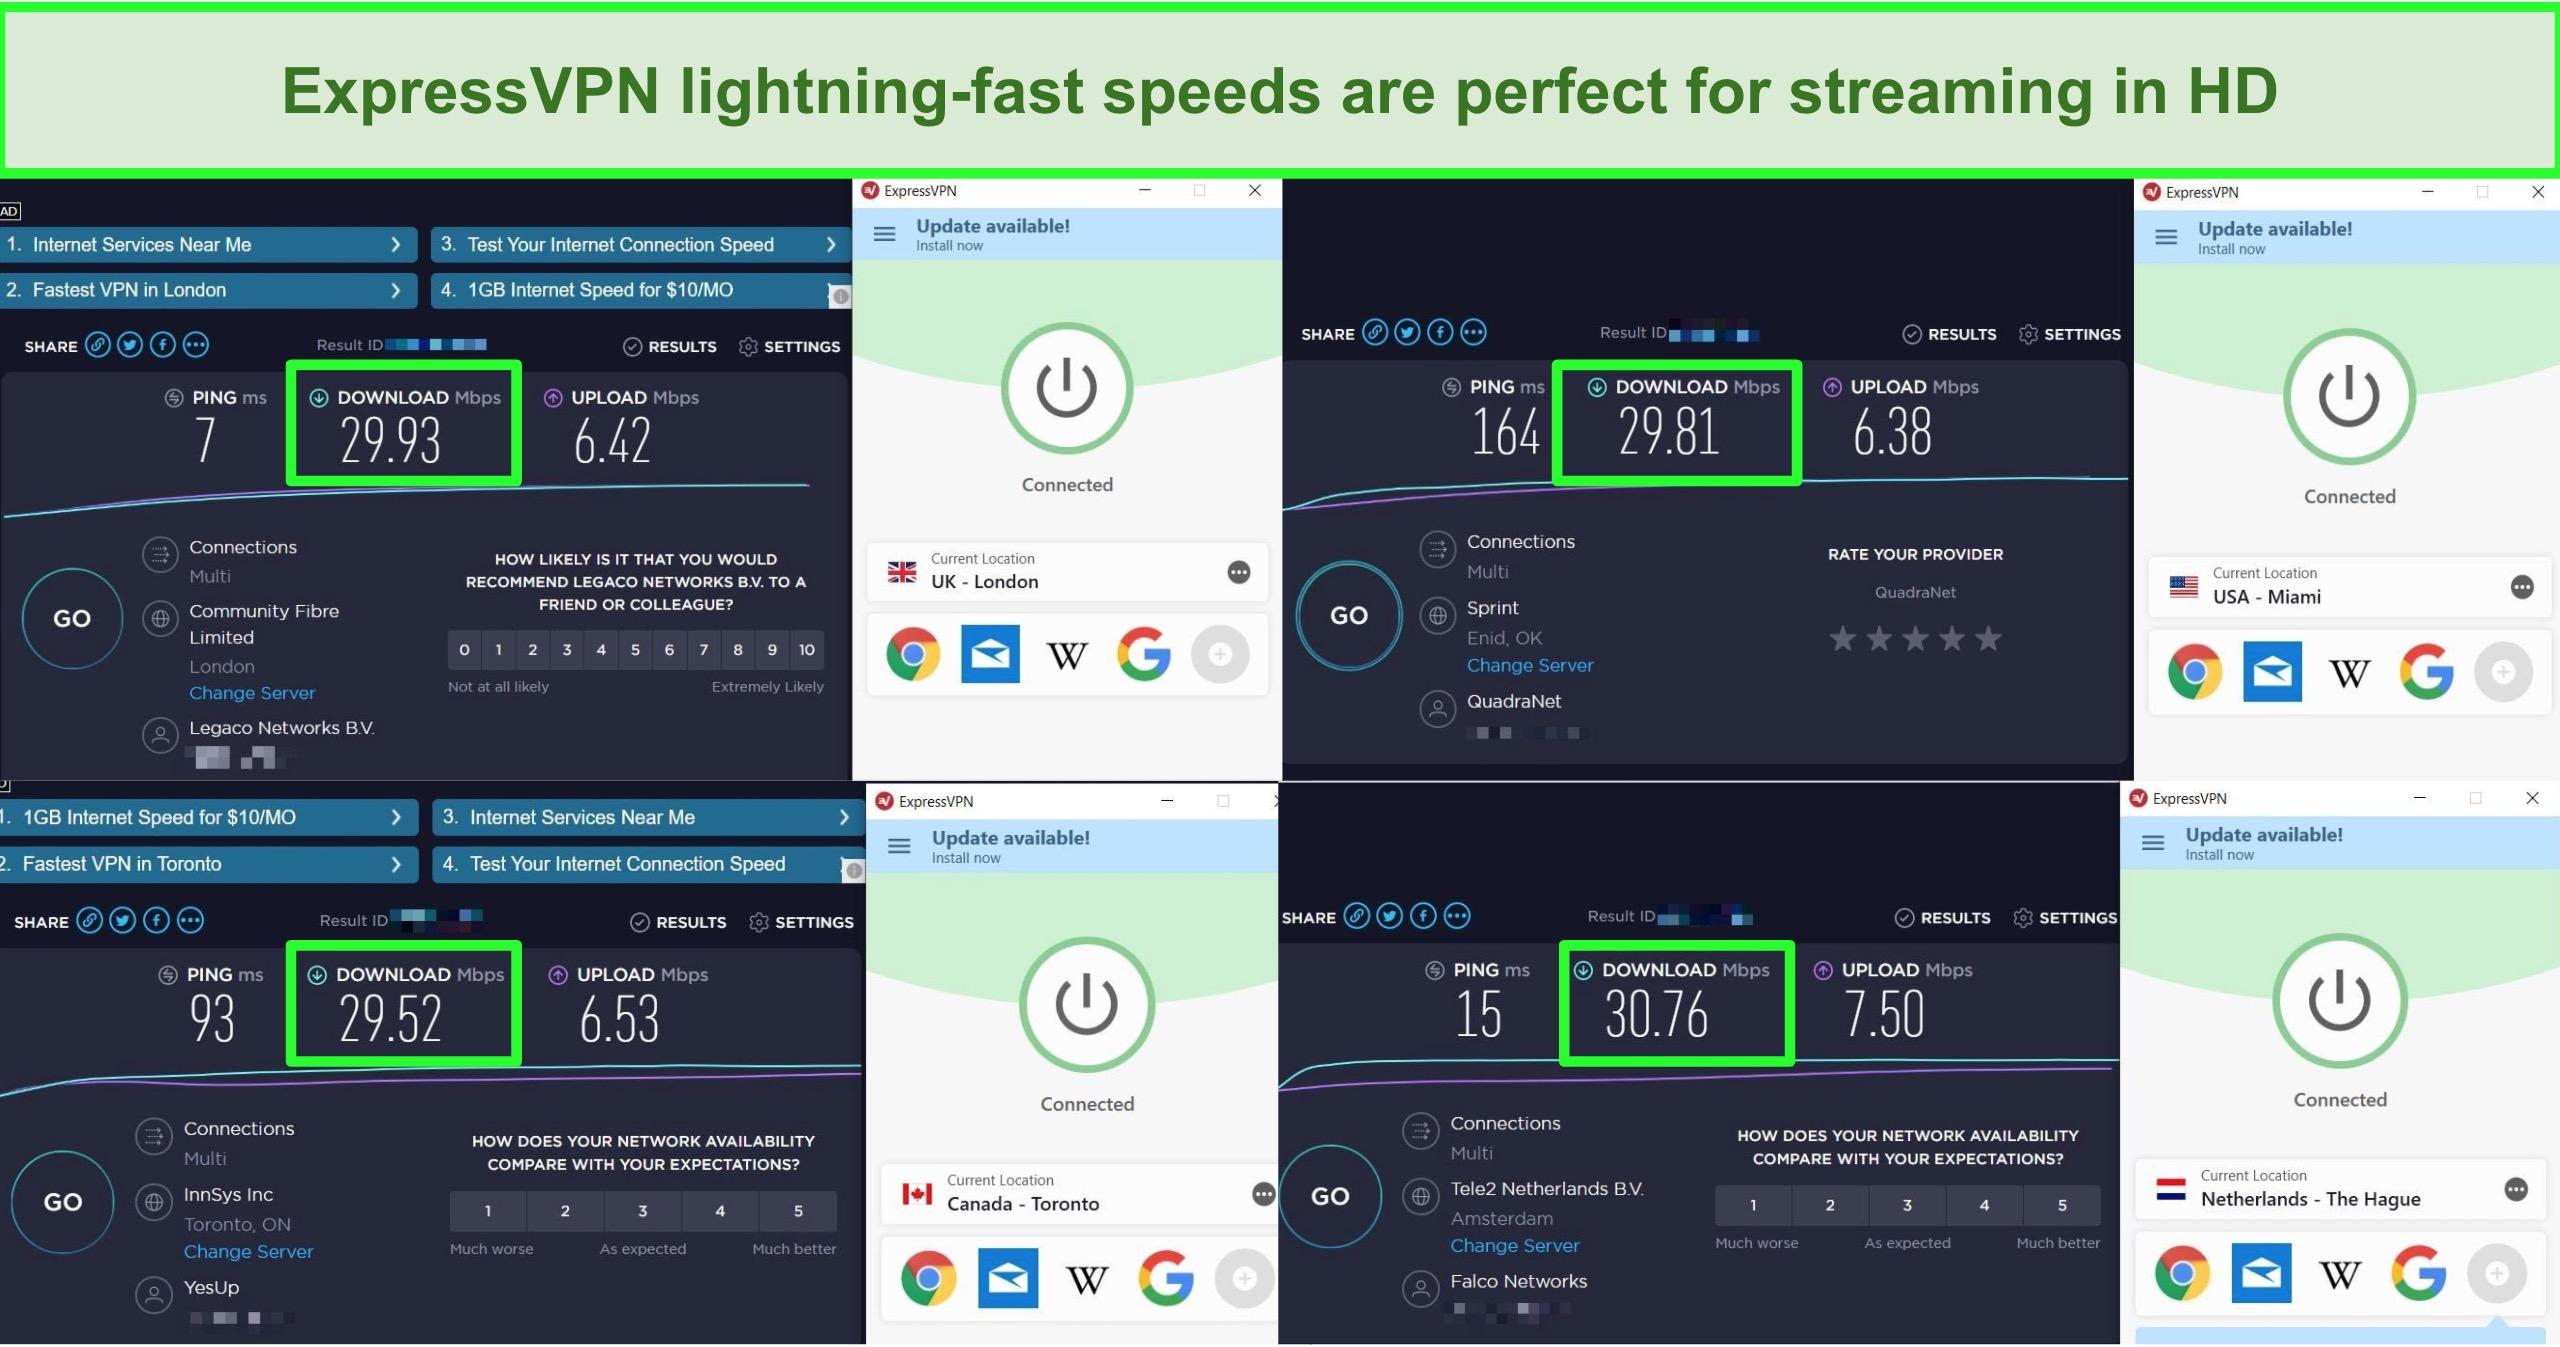 Screenshots of speedtests of 4 different ExpressVPN server locations